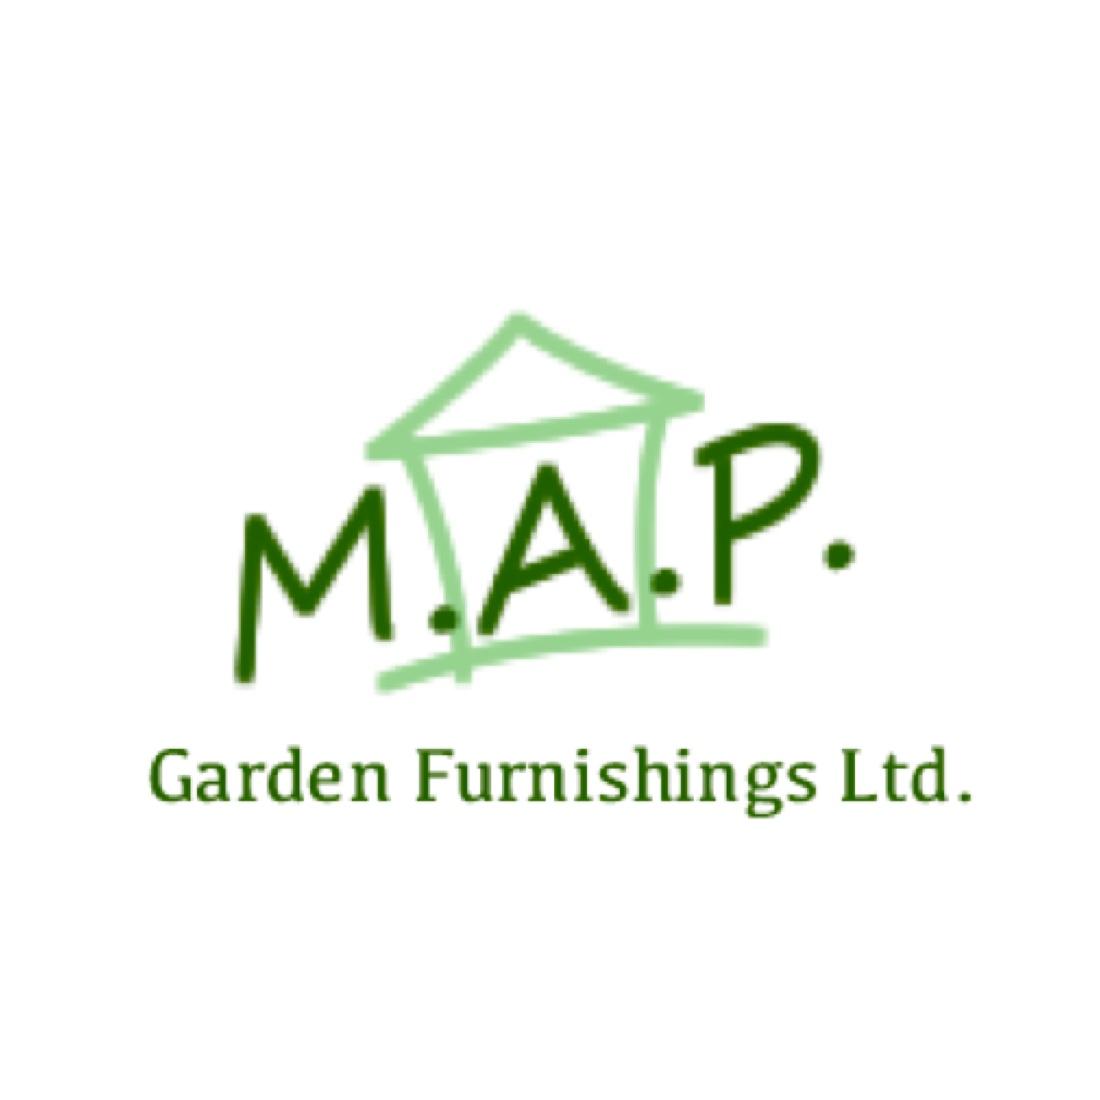 Shire Herewood Pine Lodge 28mm